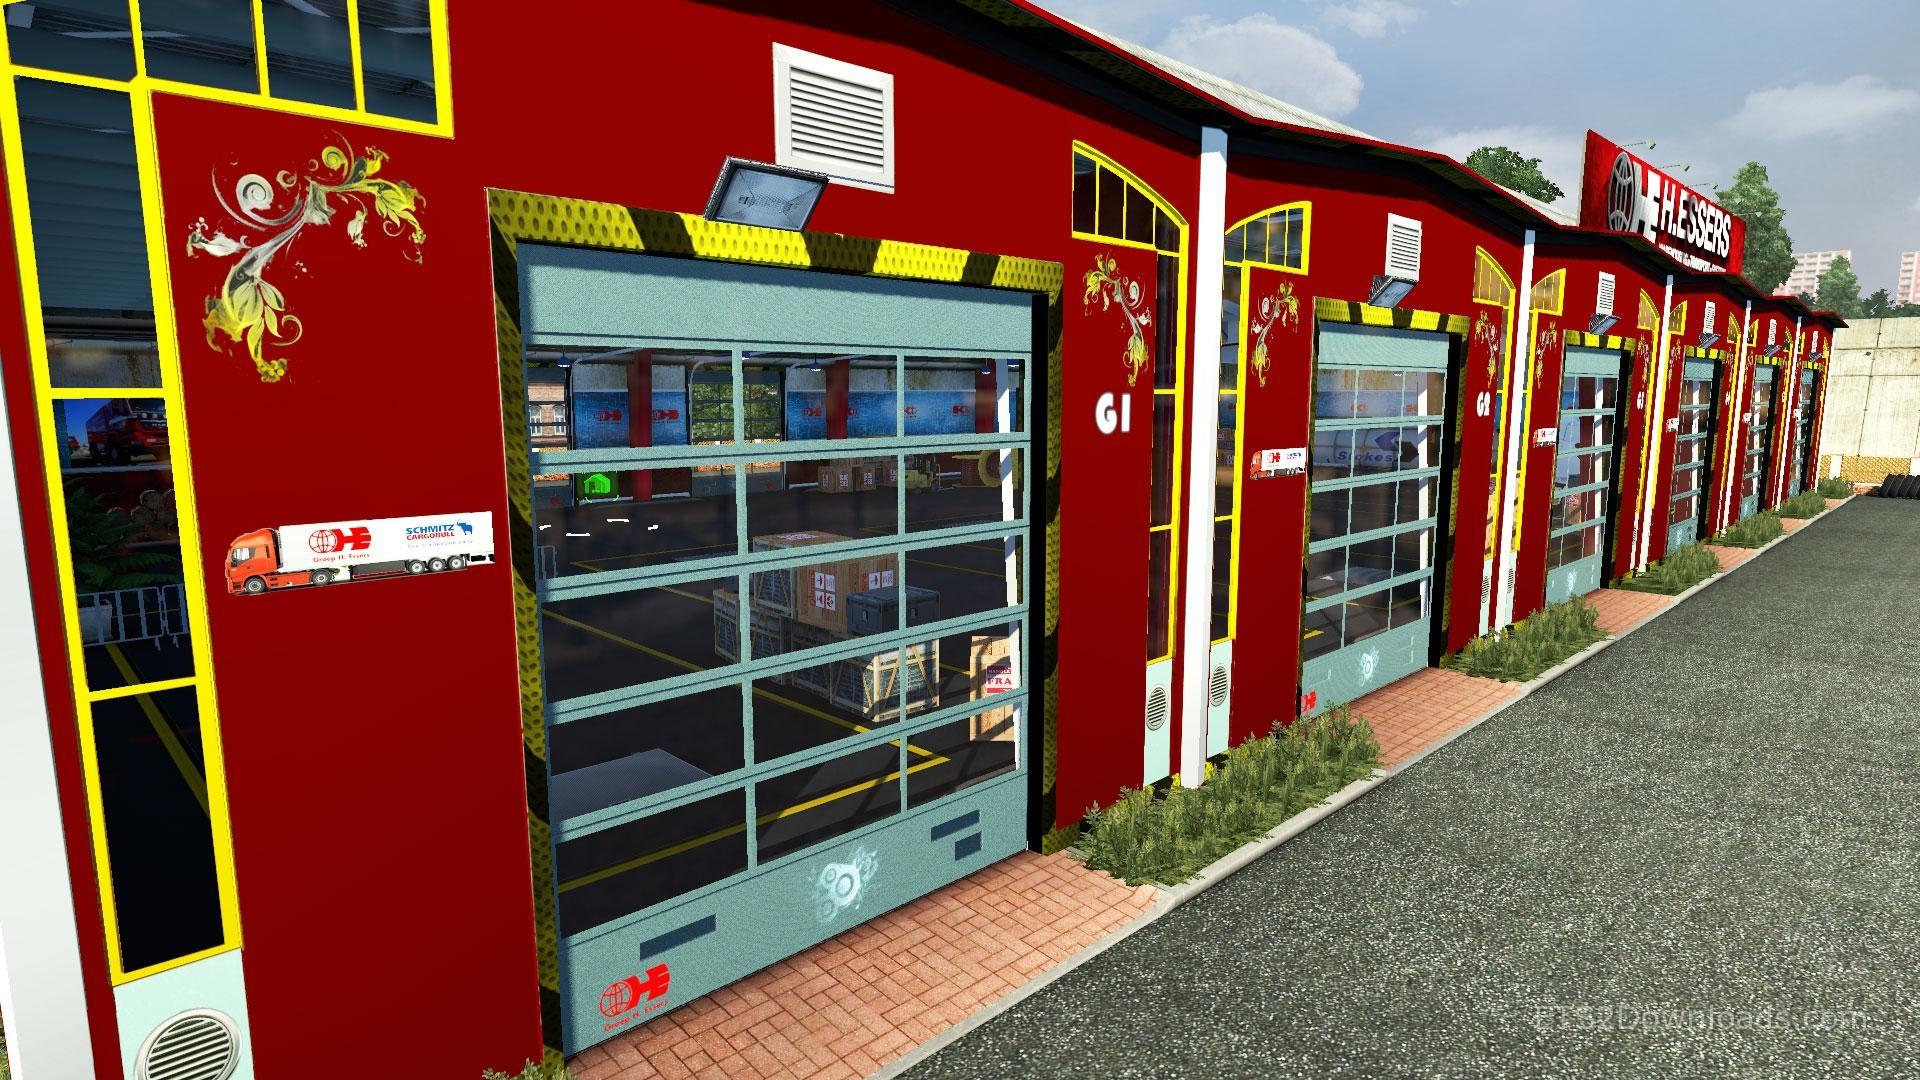 h-essers-hd-skin-for-garage-3